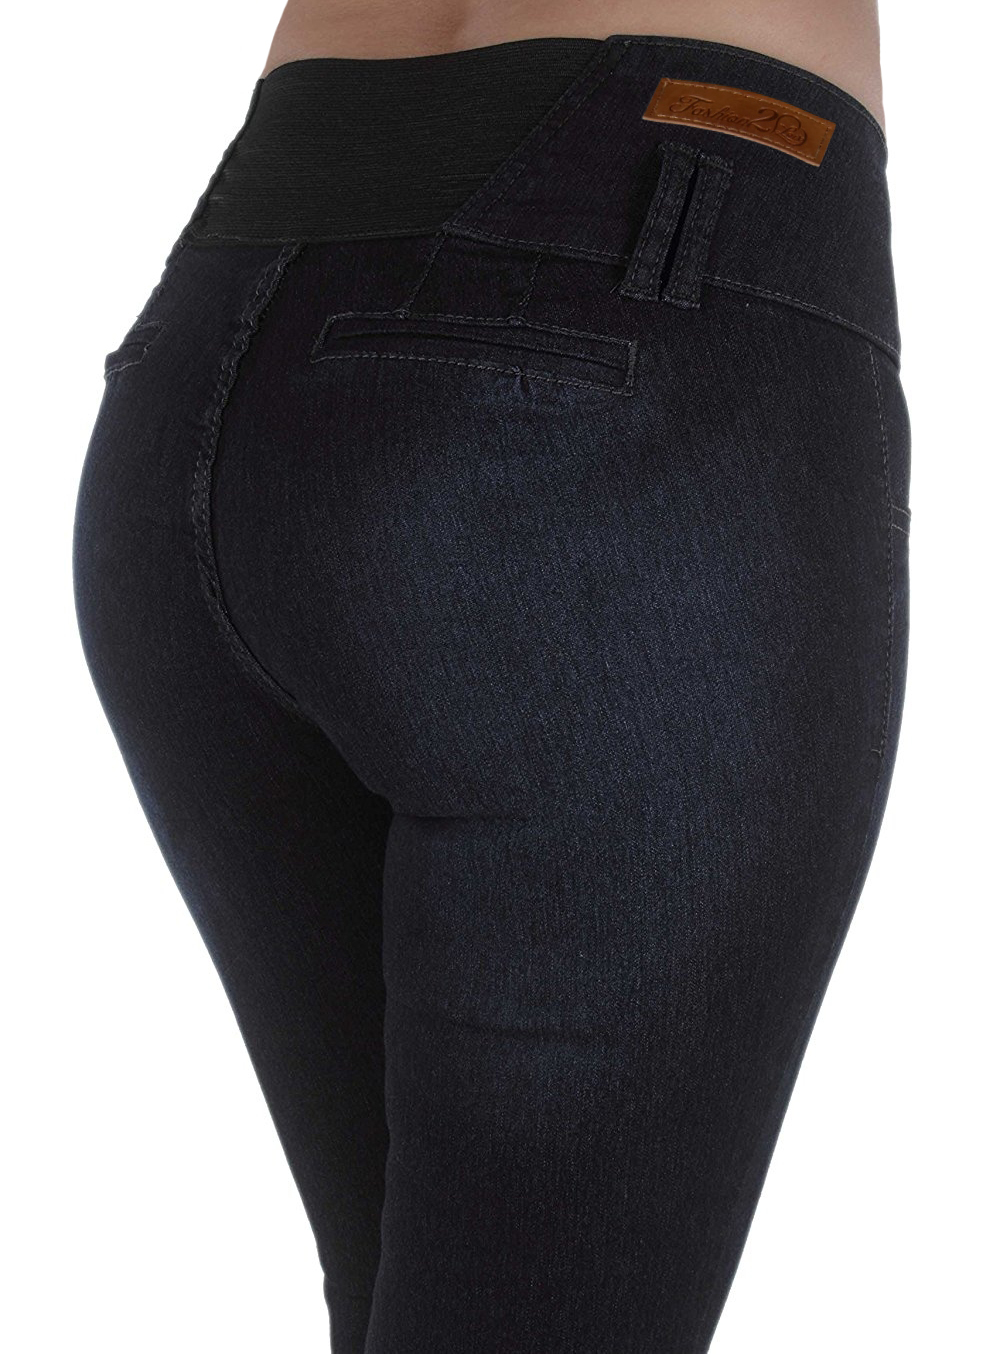 Style M652P  Plus Size High Waist Design Butt lift, Elastic Waist, Skinny Jeans